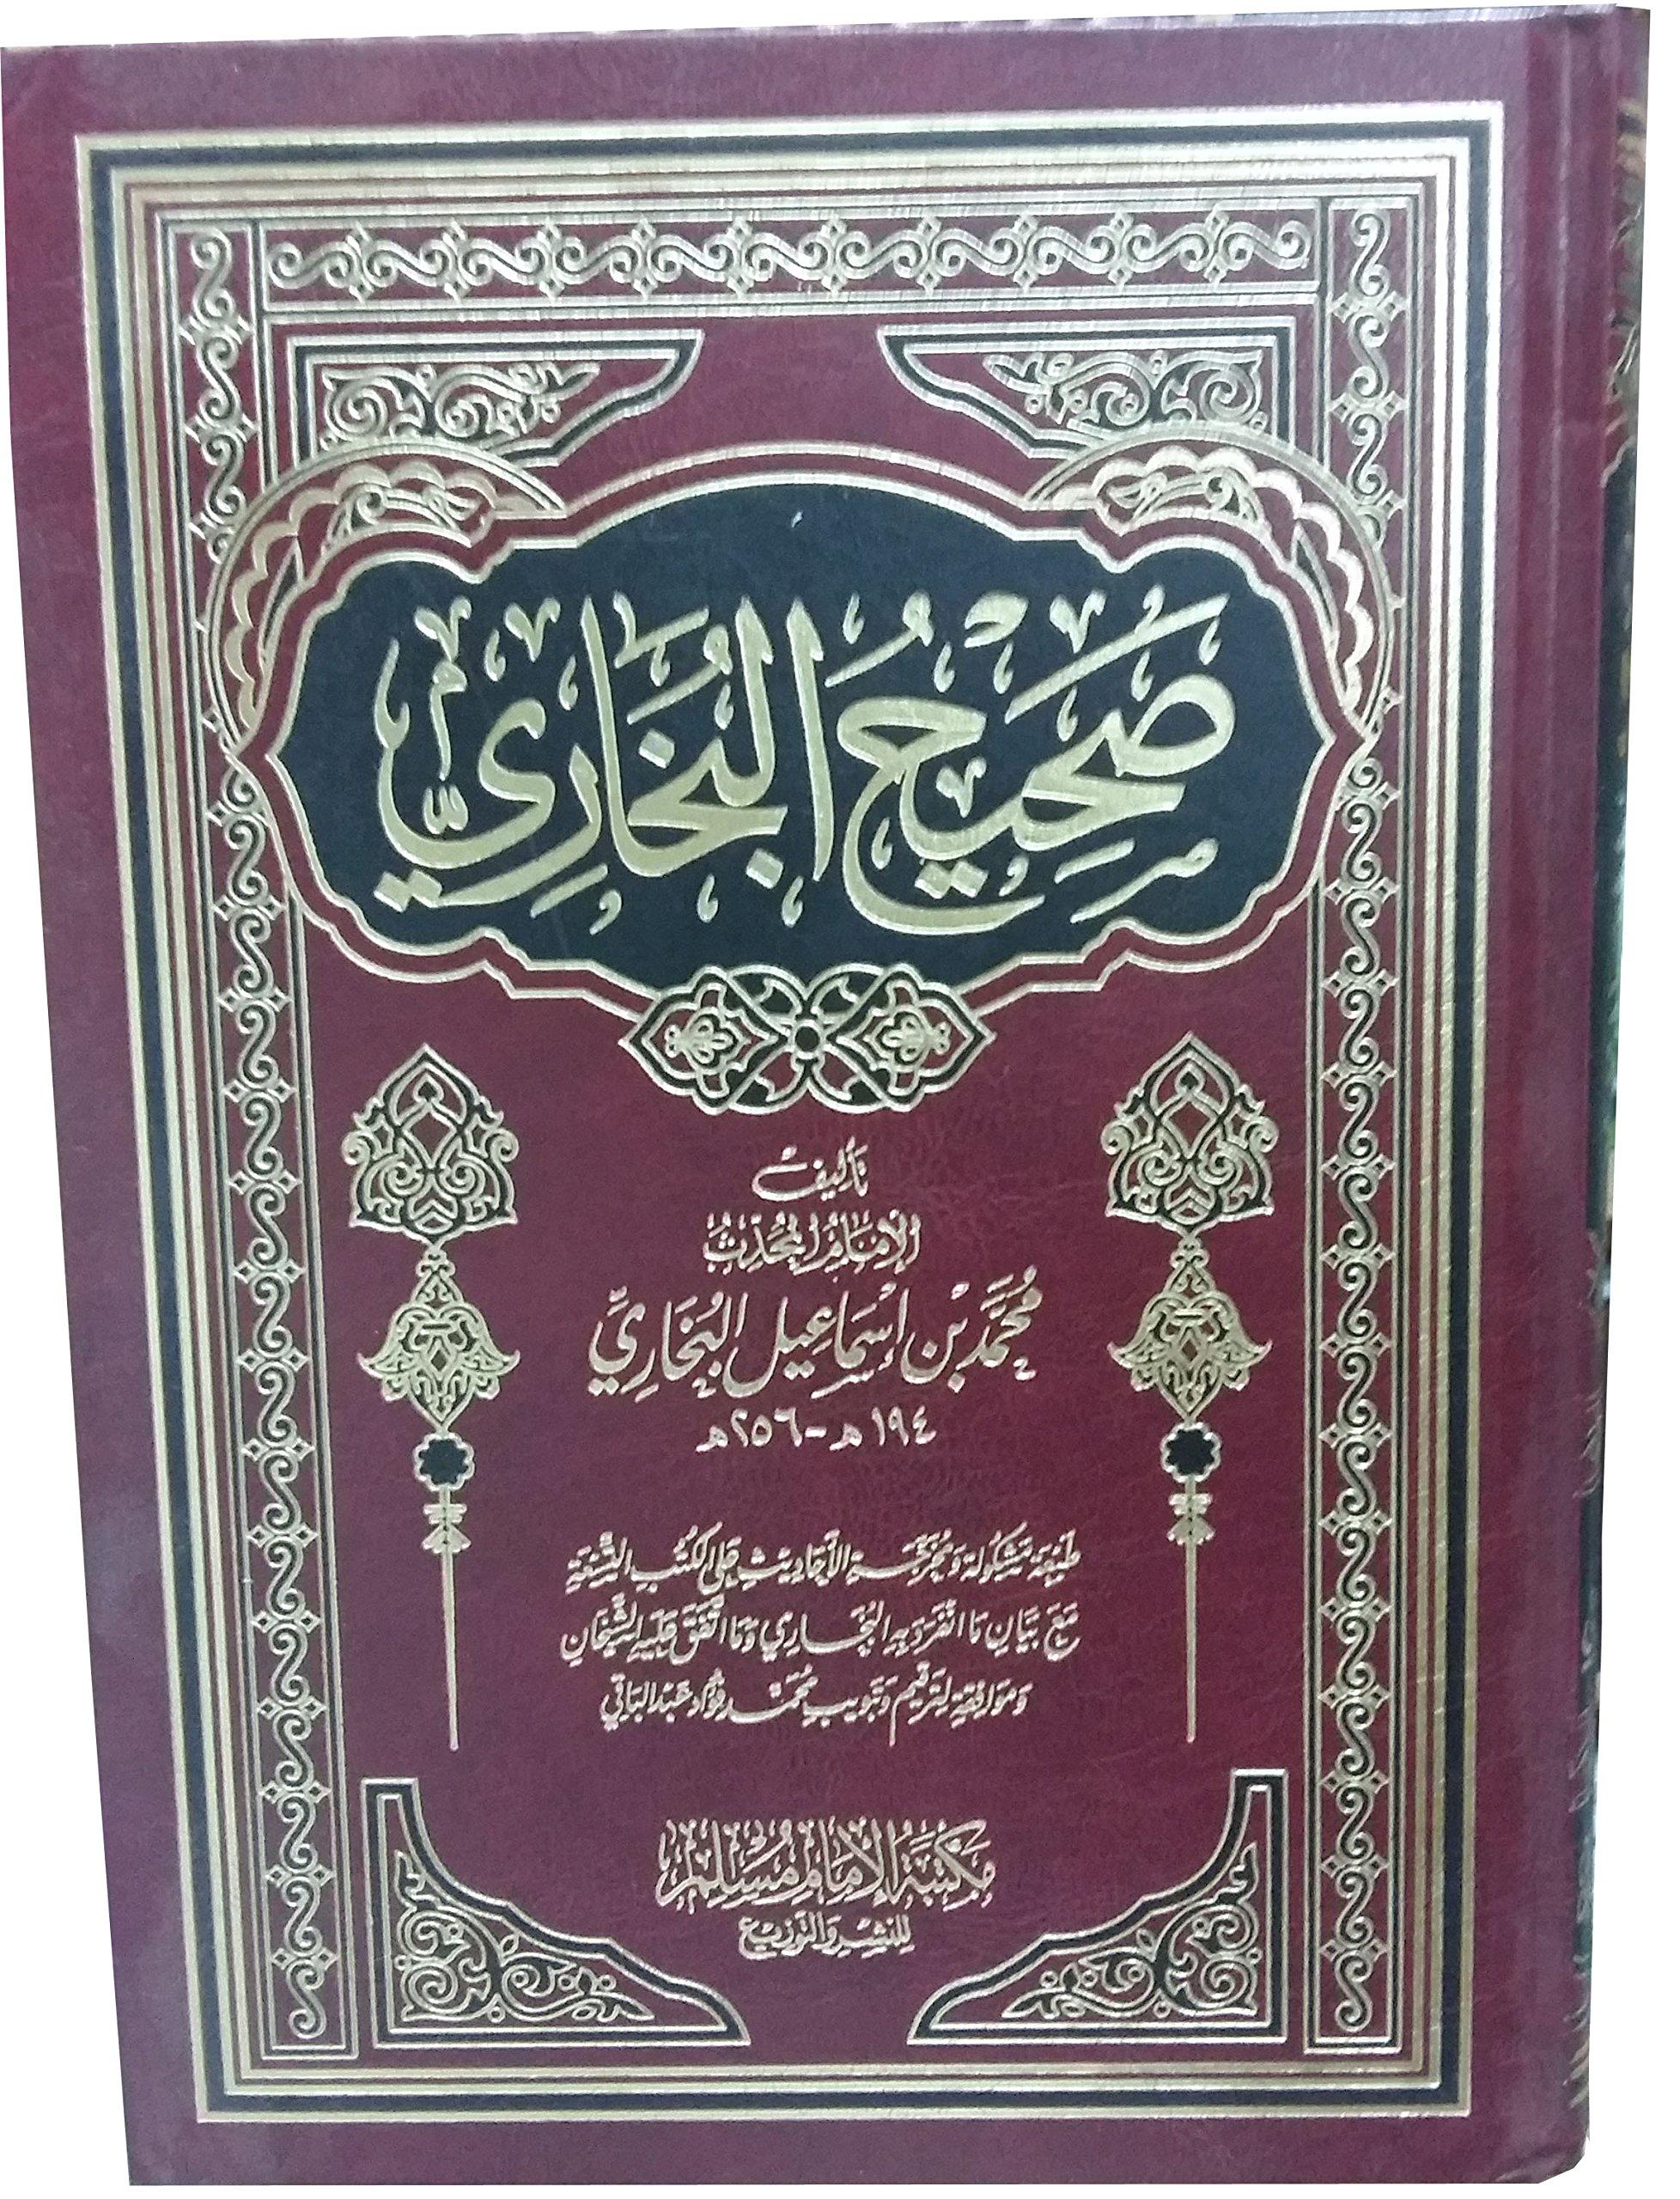 ARABIC SAHIH AL-BUKHARI - WITH HARAKAT صحيح البخاري: Amazon co uk